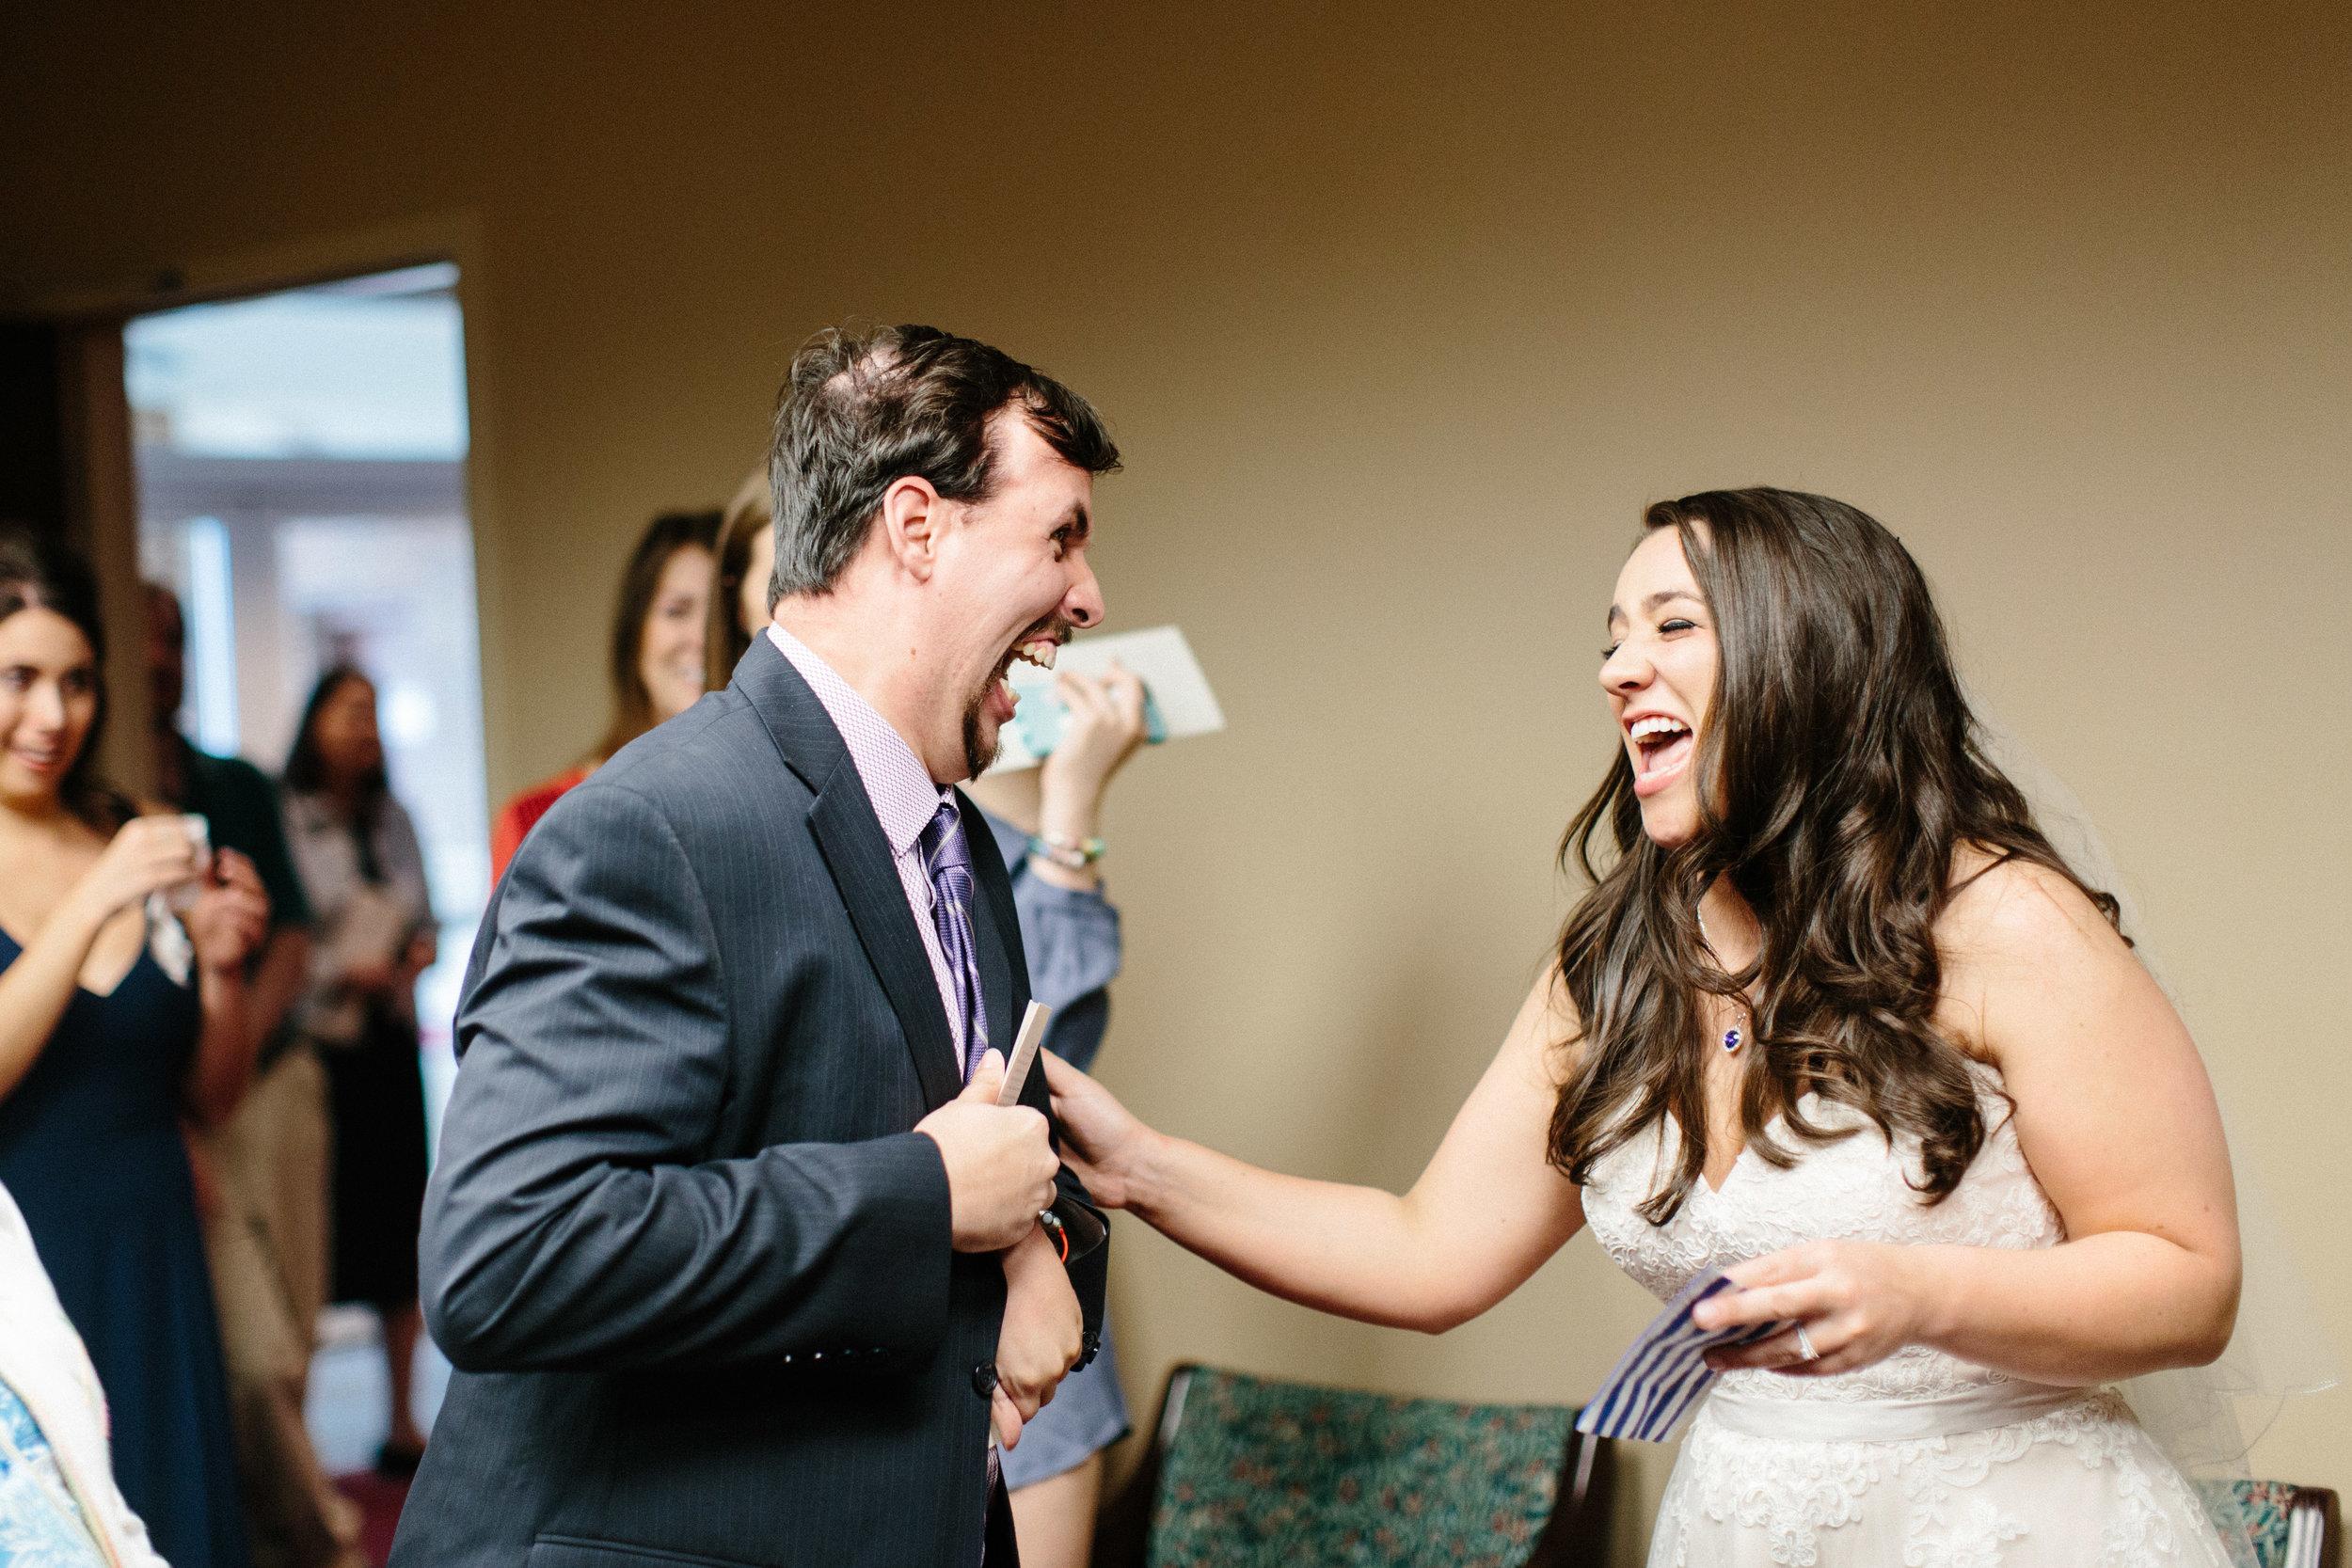 roswell_st_peter_chanel_catholic_avalon_hotel_alpharetta_wedding-1658.jpg